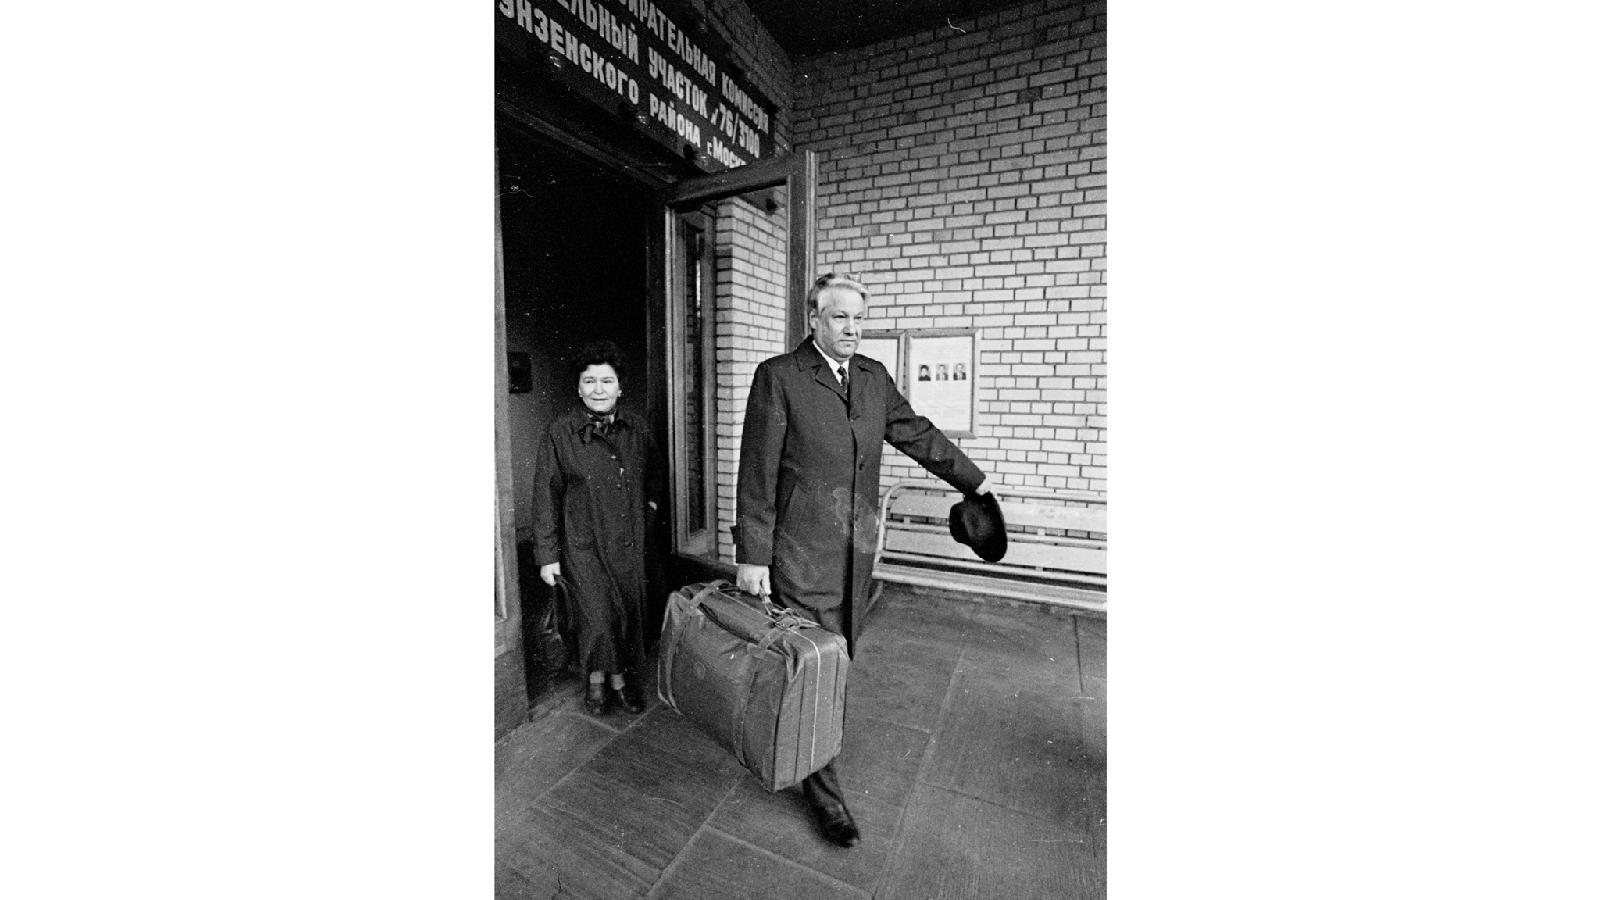 Борис Ельцин, 1989